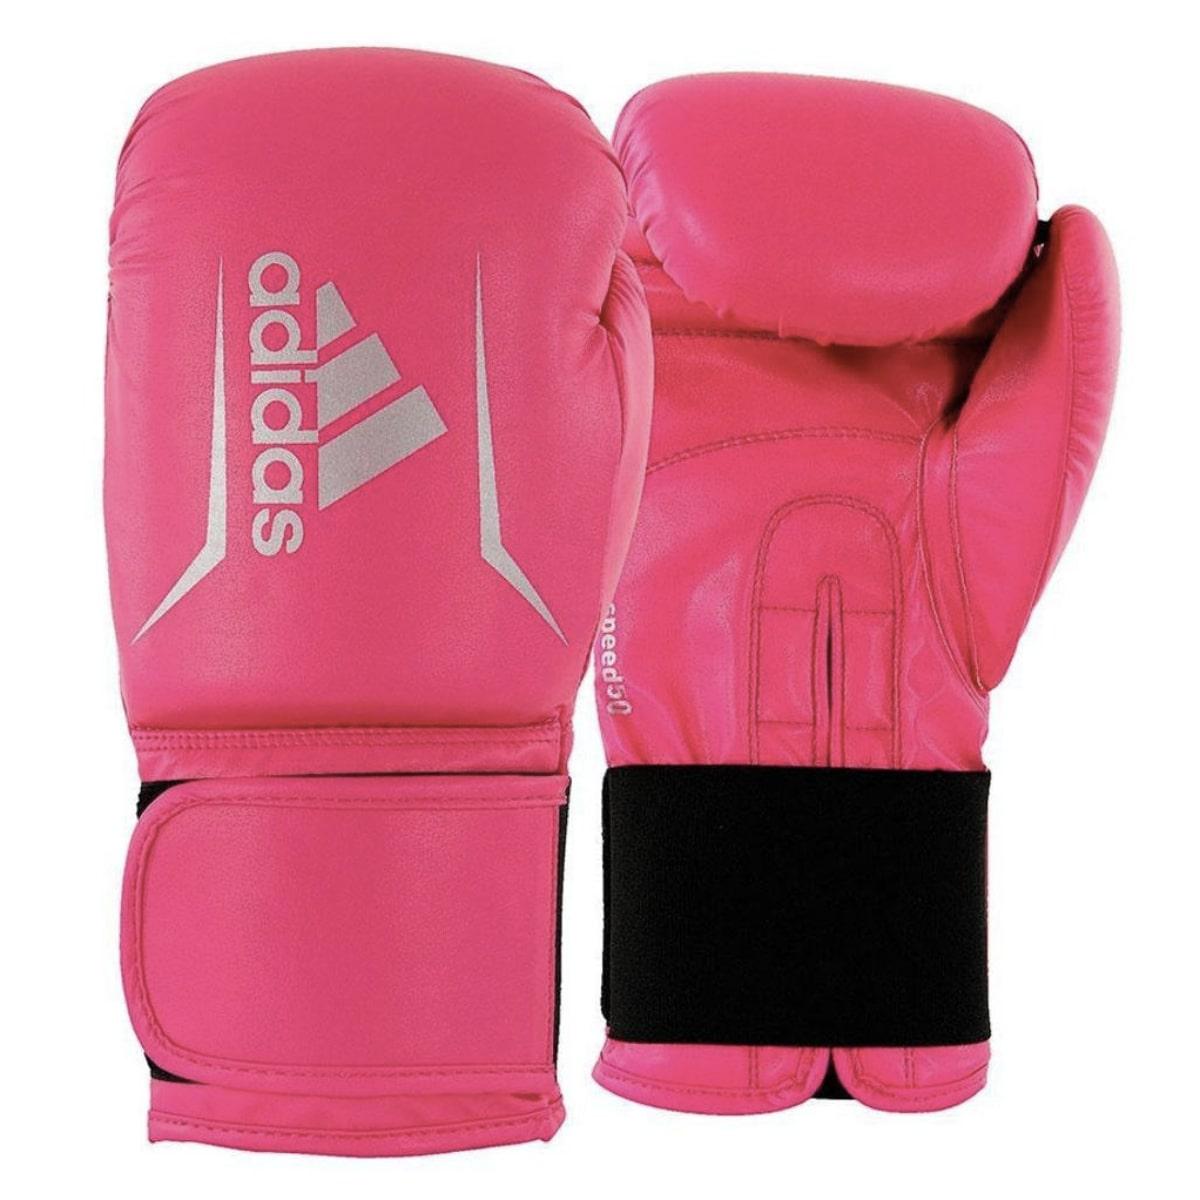 Luva Boxe Adidas Speed 50 - Rosa